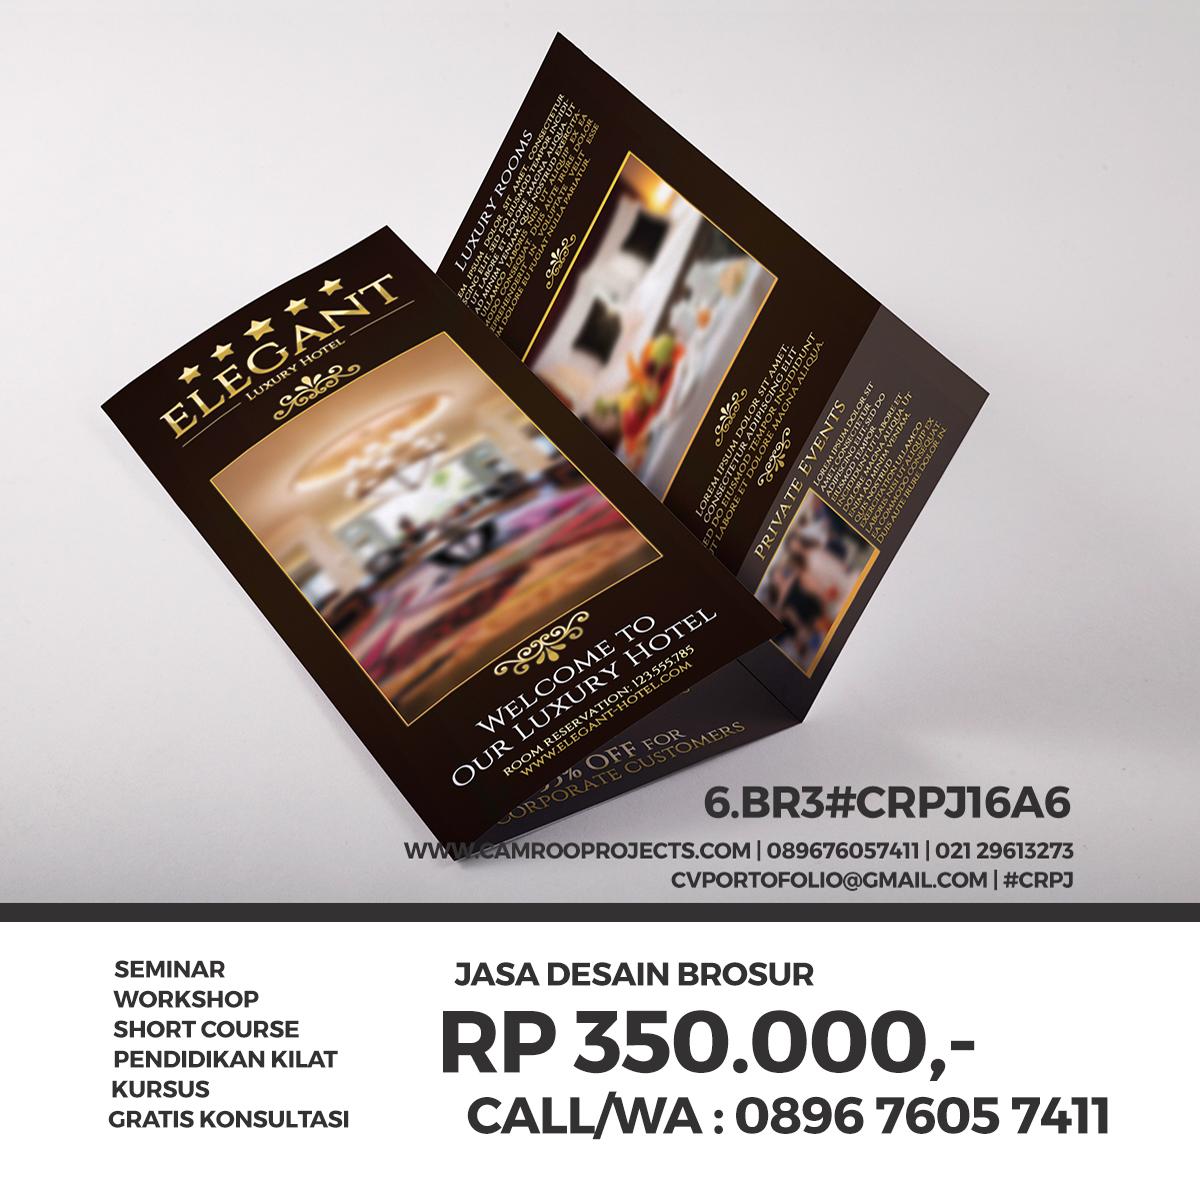 Jasa Desain Brosur/Flyer Di Depok